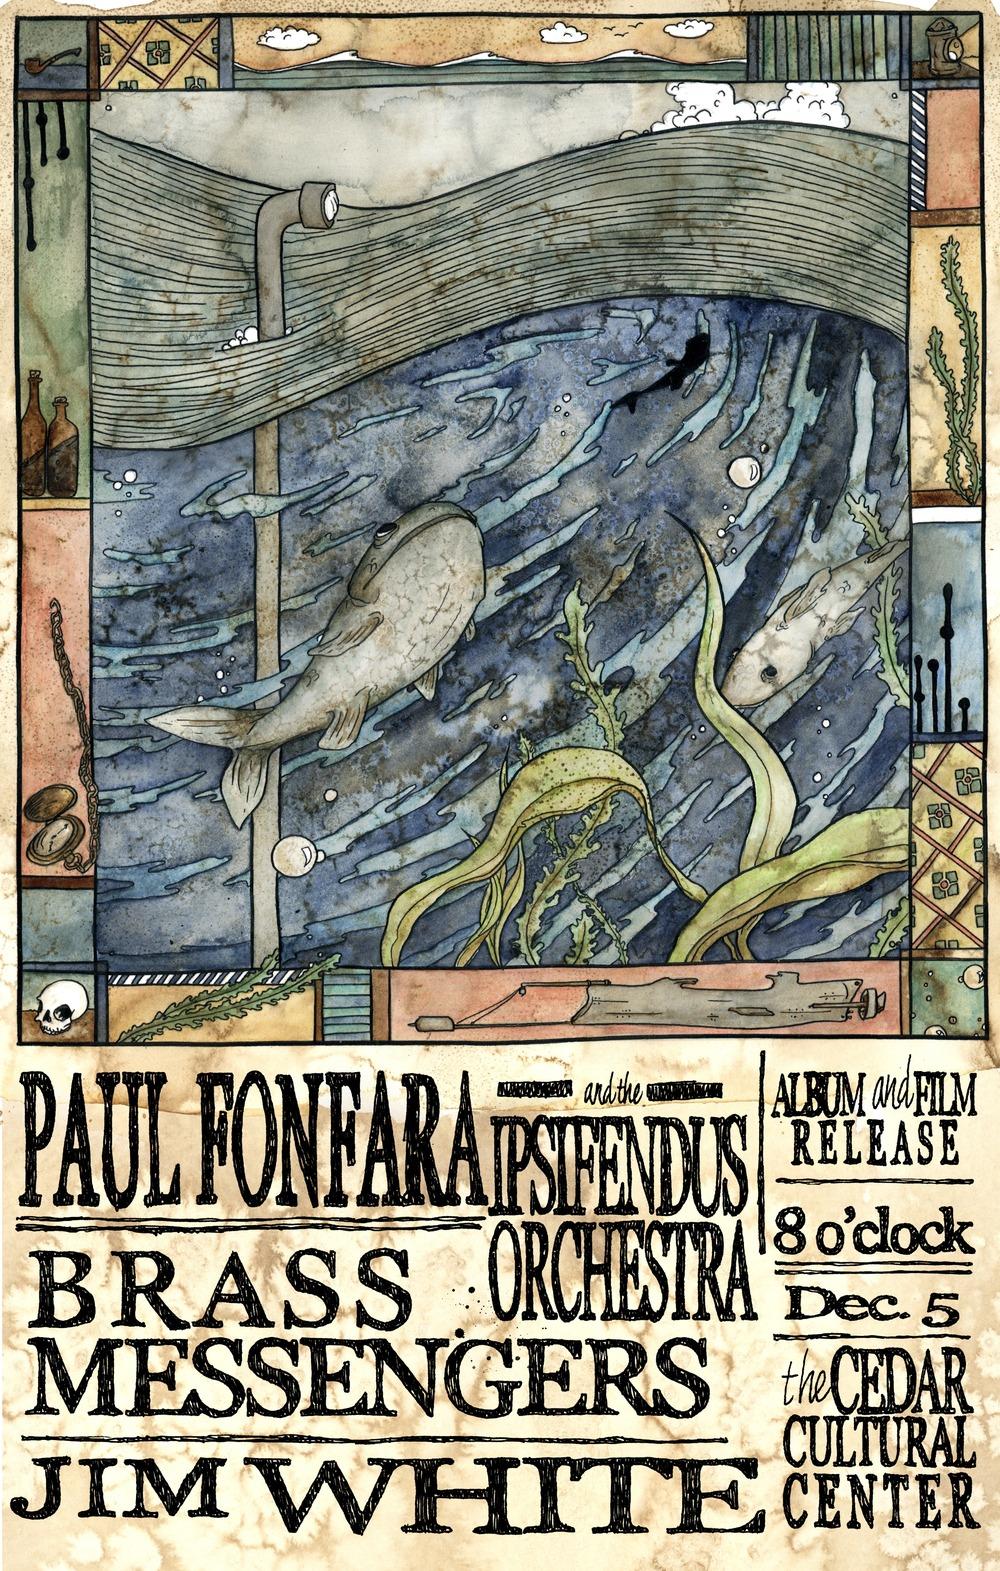 housitania release poster lo res.jpg